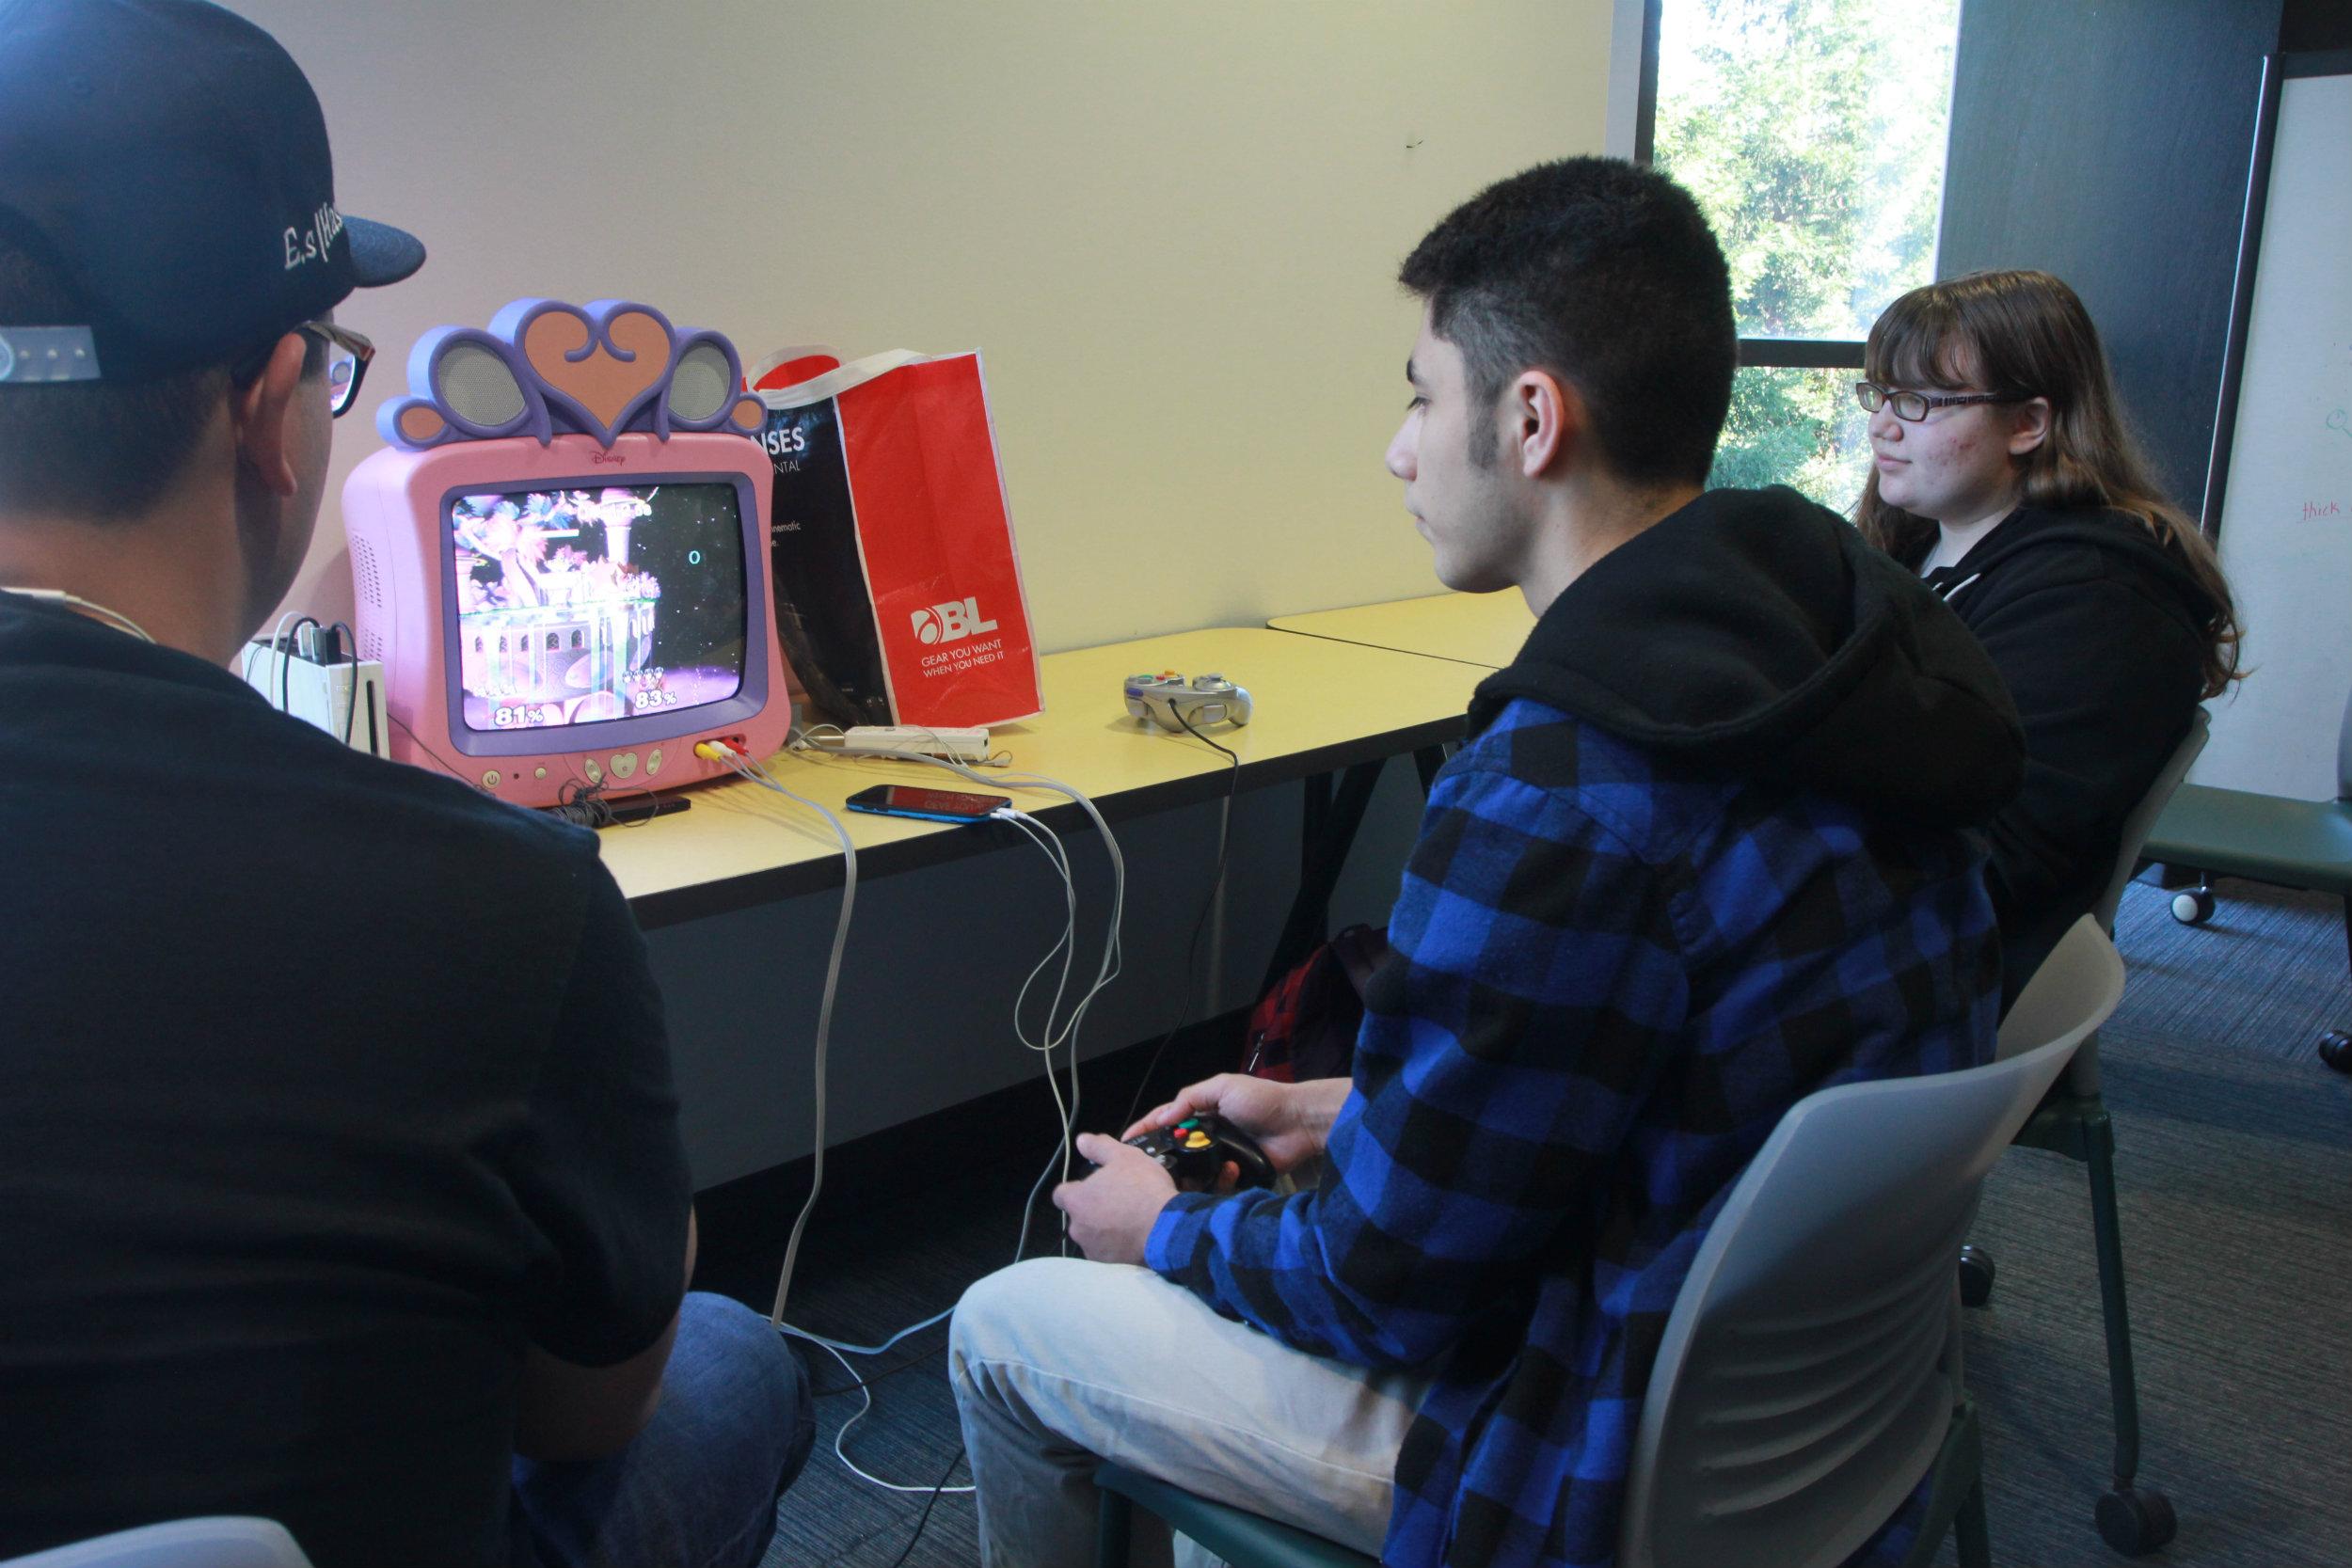 The State Hornet Super Smash Bros Club Members Share A